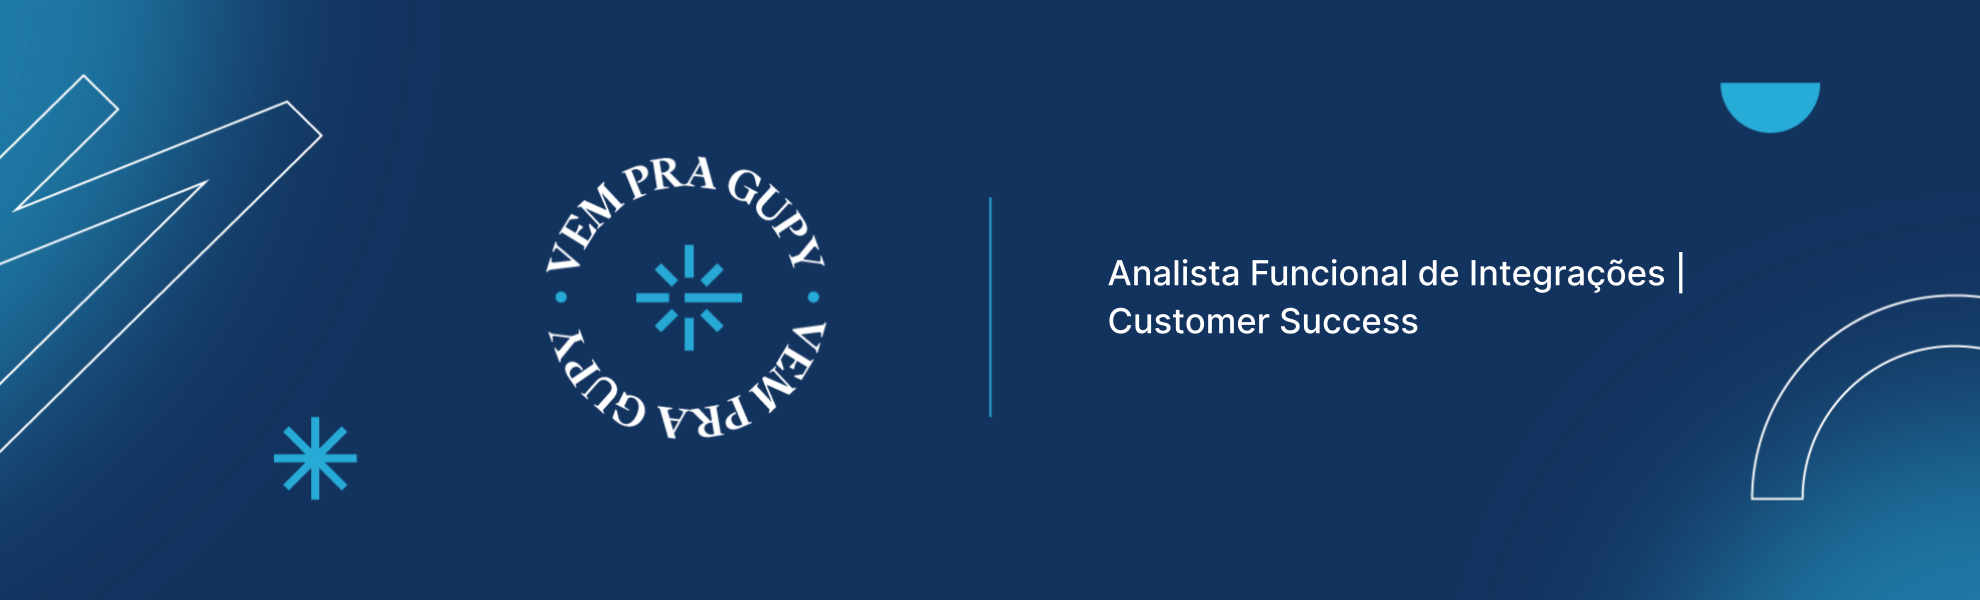 Analista Funcional de Integrações - Customer Success